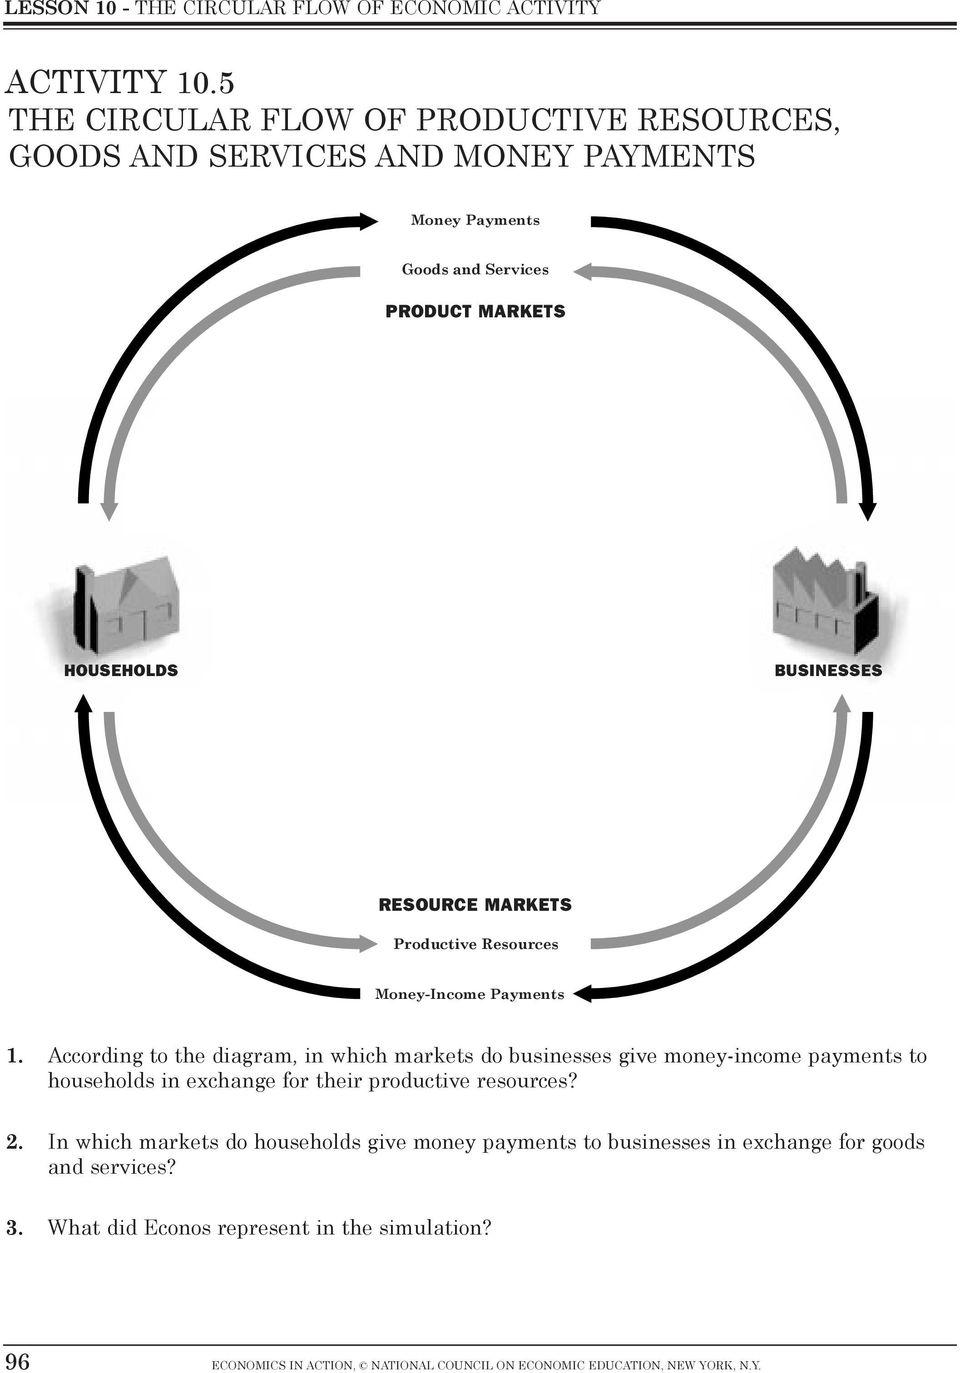 Circular Flow Of Economic Activity Worksheet Answer Key : circular, economic, activity, worksheet, answer, Lesson, Circular, Economic, Activity, Download